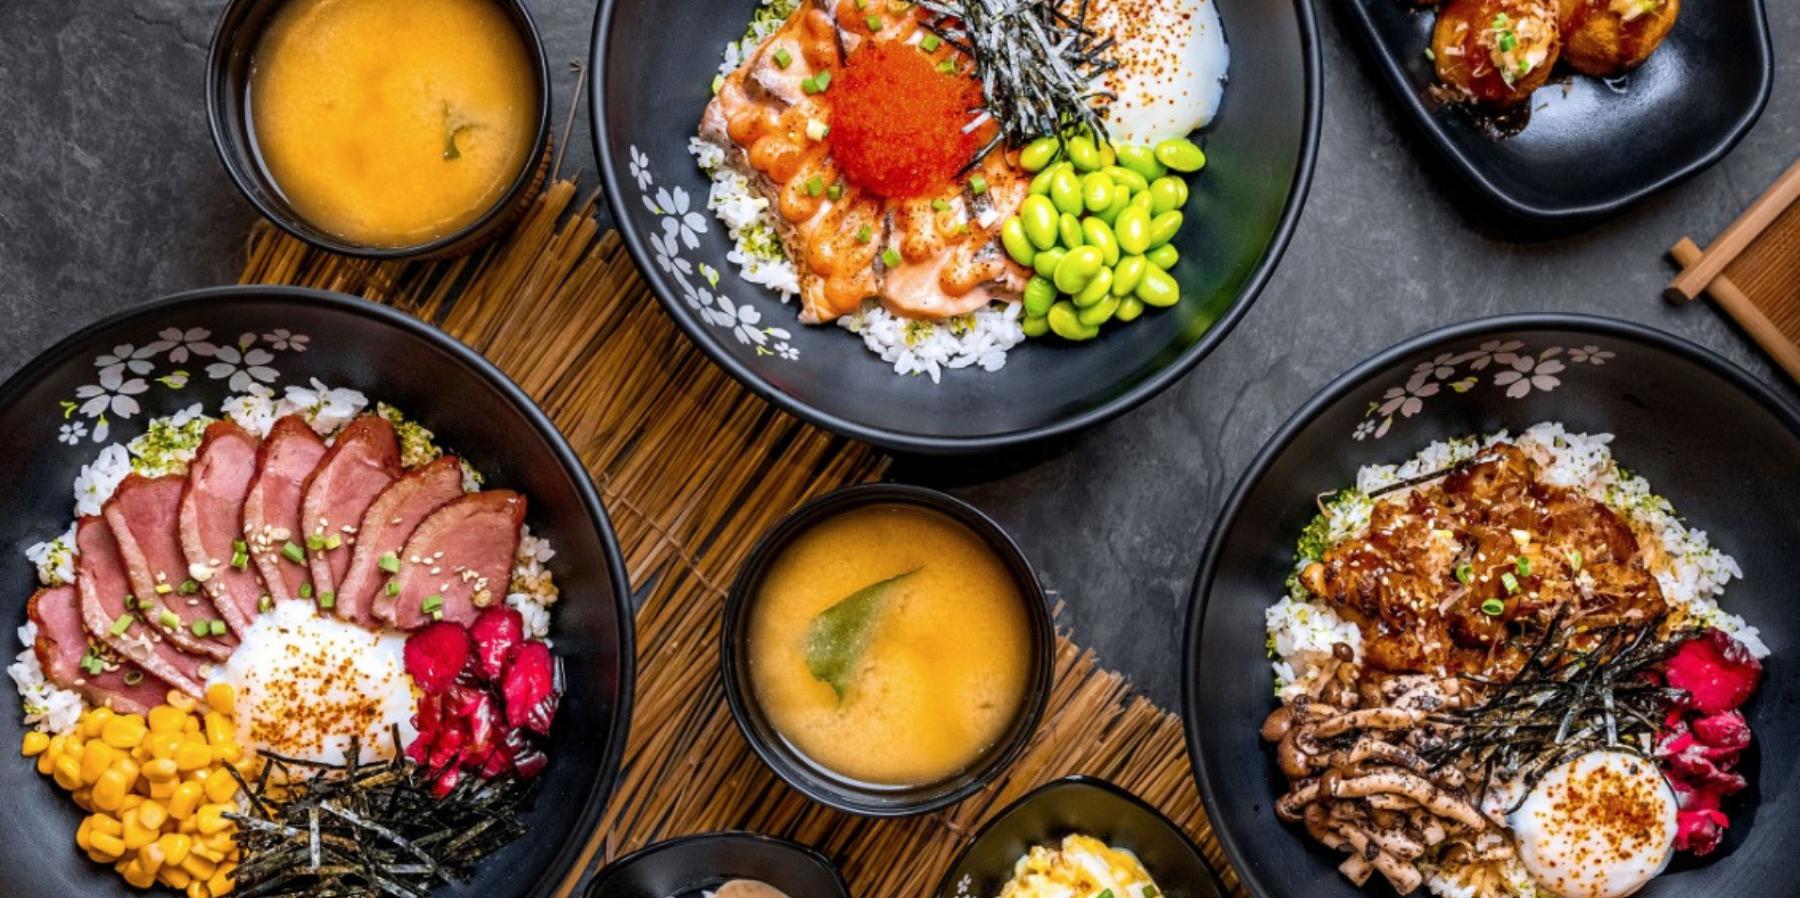 30% OFF All-New Akita Komachi Rice Bowls – including Yakitori Chicken with Truffled Mush